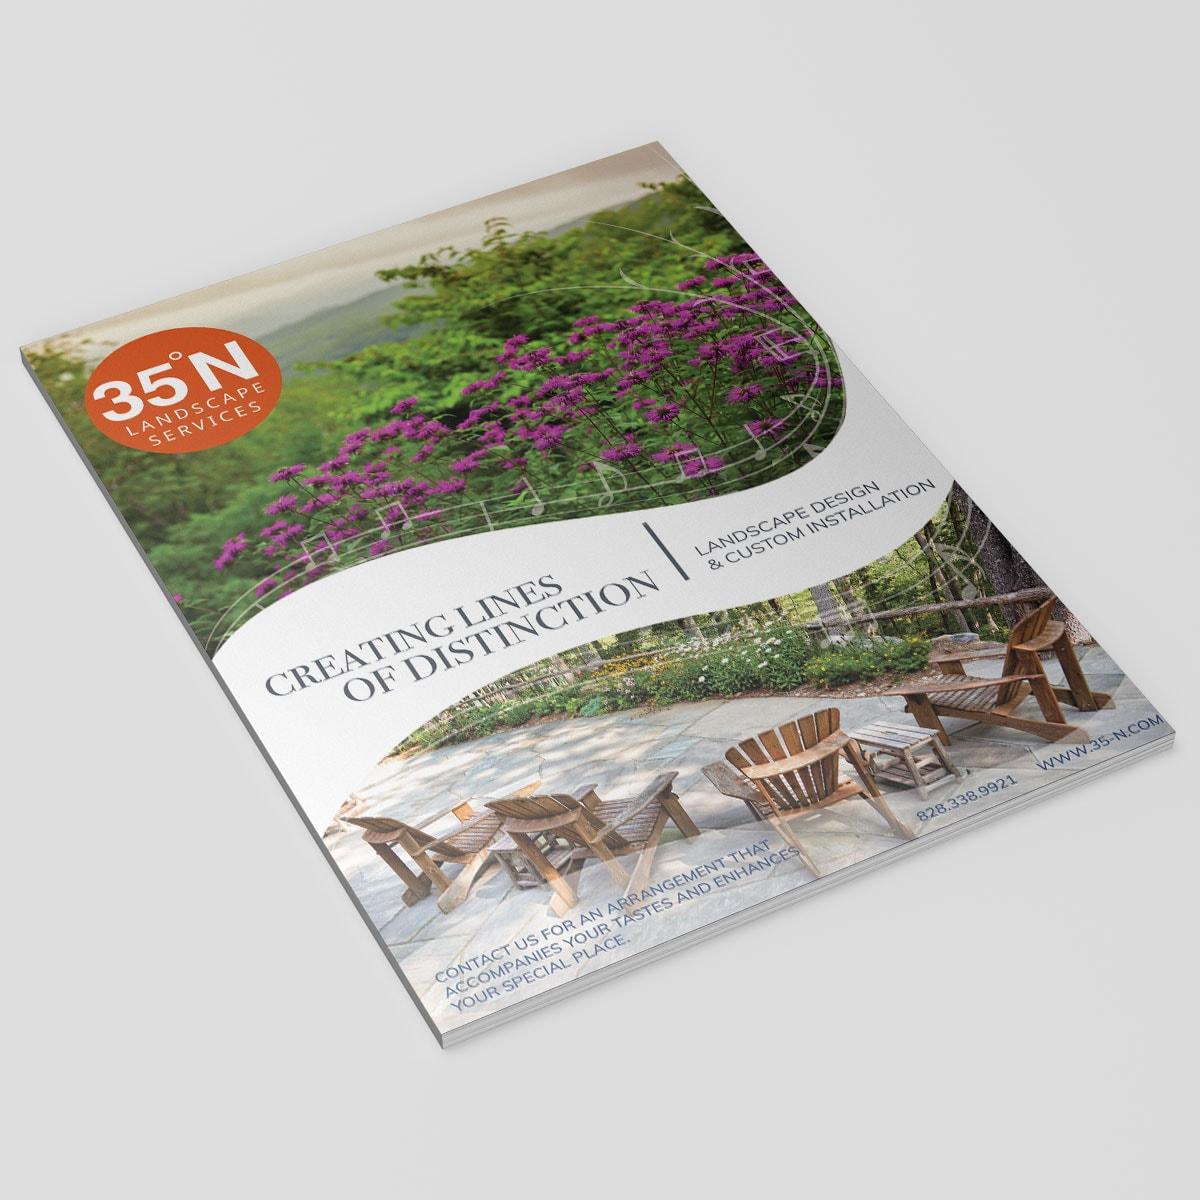 35n-magazine-ad-mockup